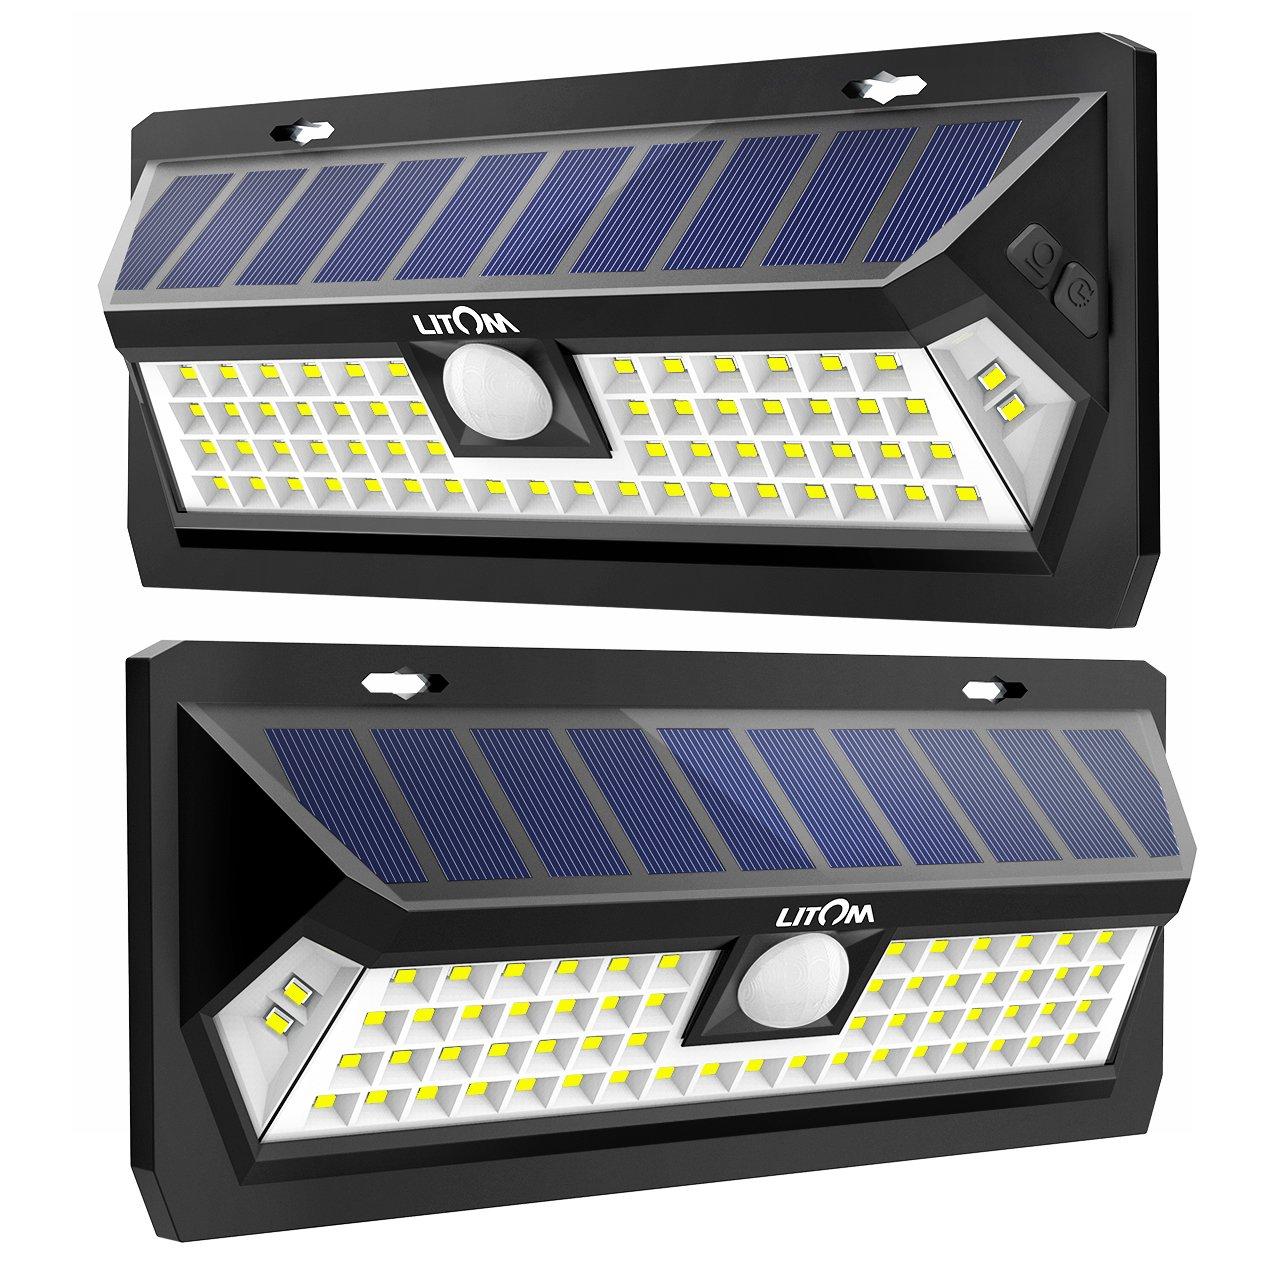 LITOM Solar Lights Outdoor 62 LED, Adjustable Lighting Time Solar Motion Sensor Light with 270° Wide Angle and Waterproof Design, Wireless Solar Lighting for Front Door, Yard, Garage, Deck (2 Pack)